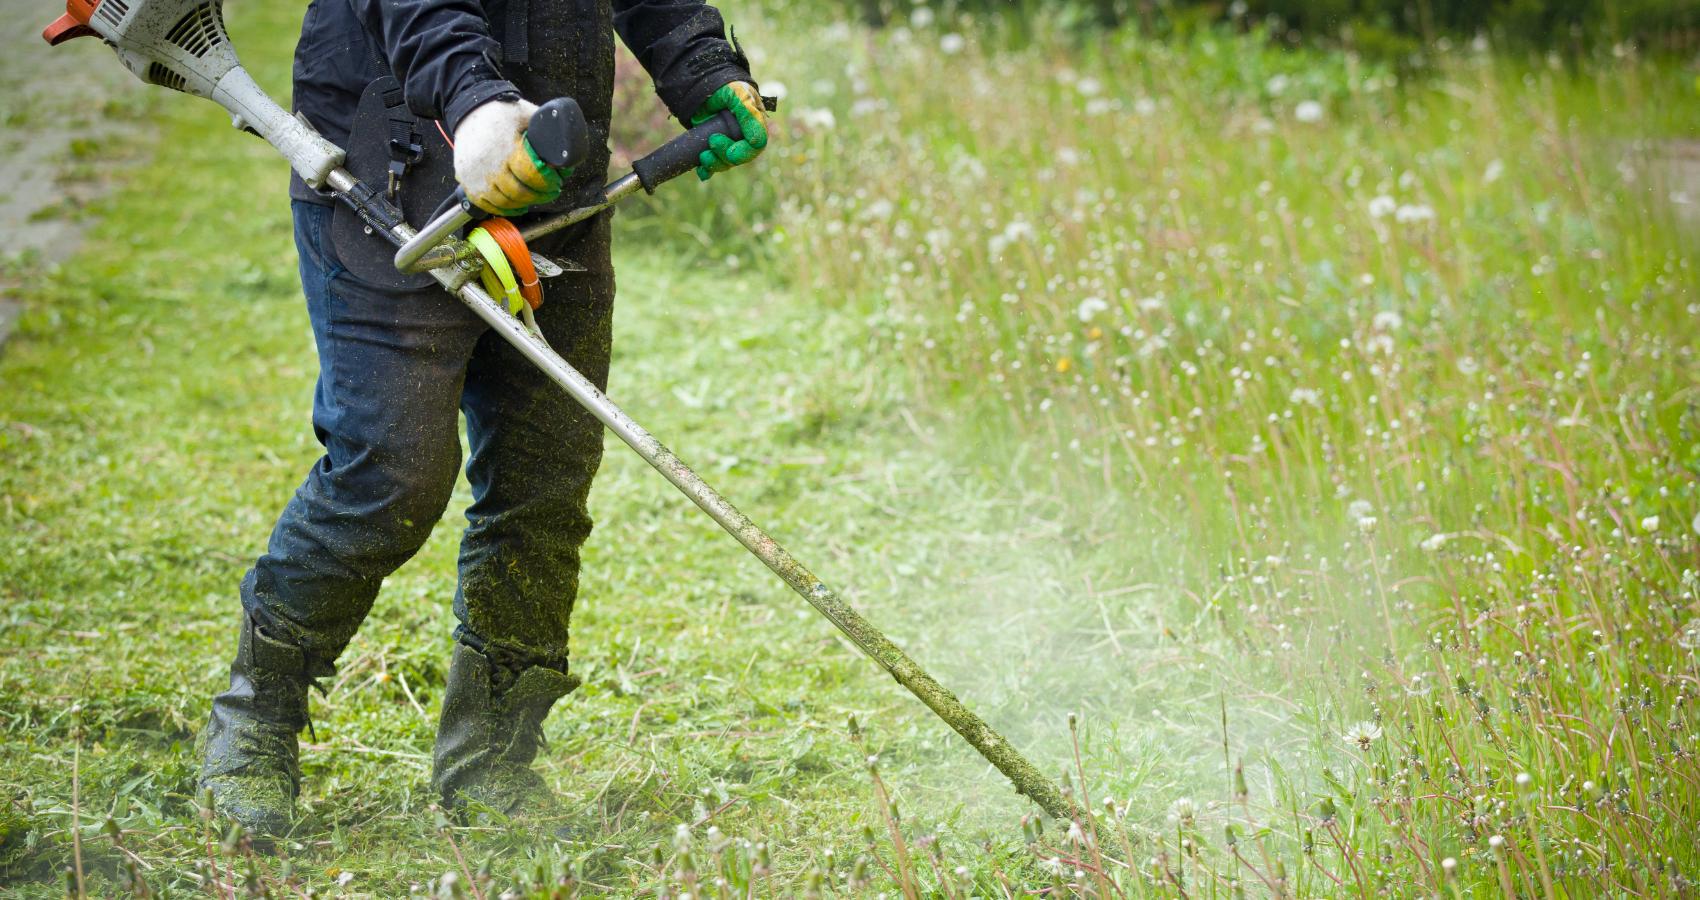 Vegetation Management services provided by Gothic Landscape